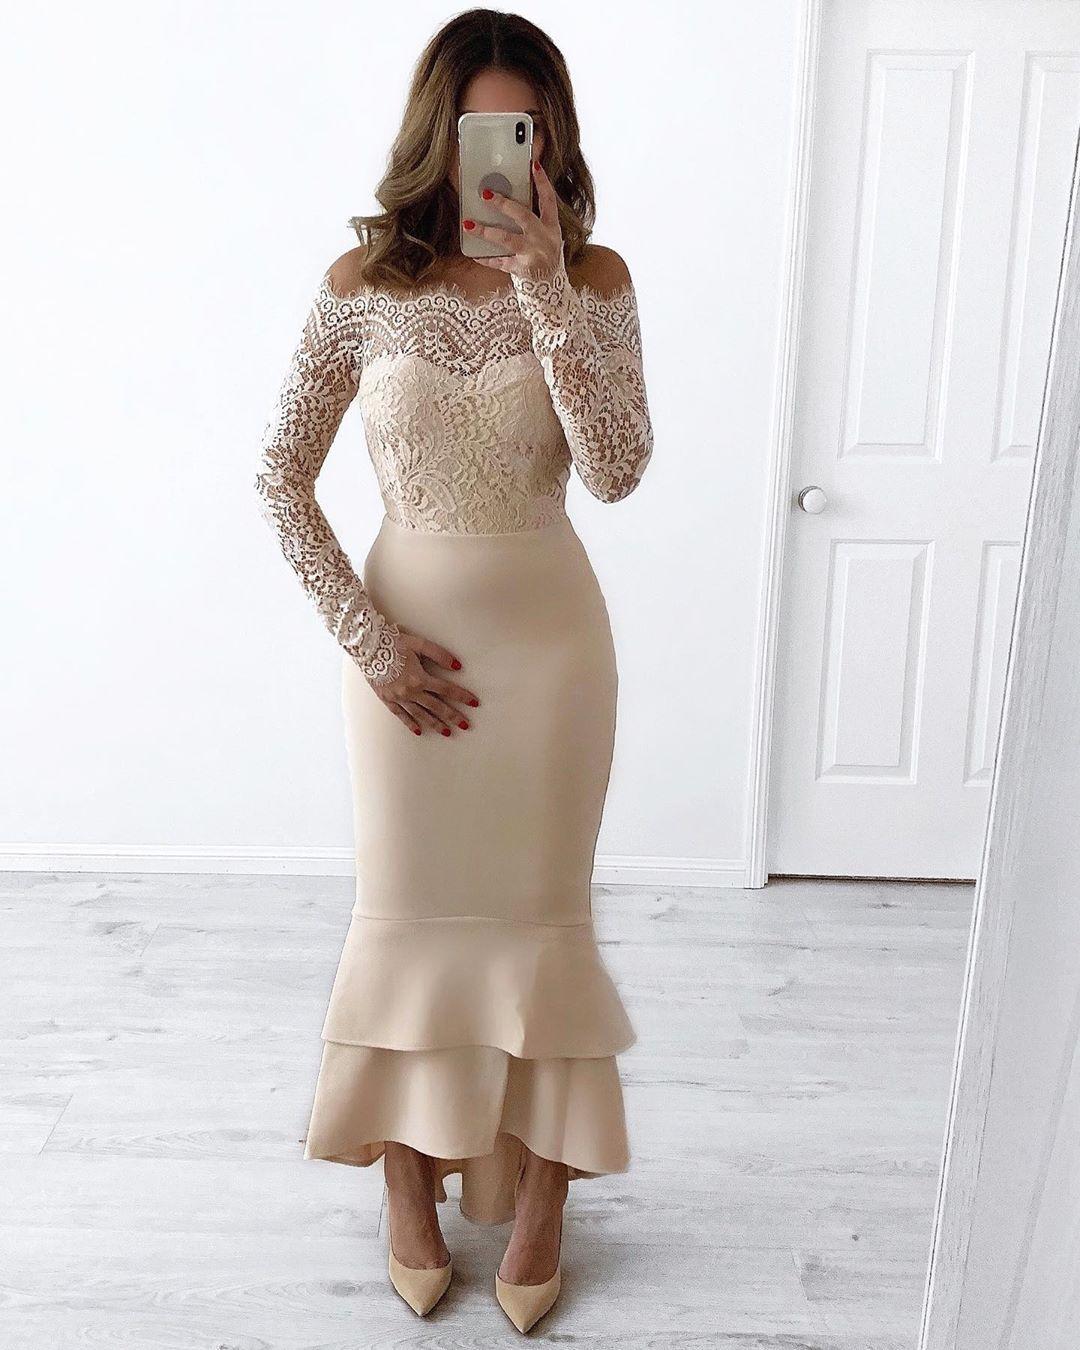 2,170 likes, 59 comments - clara famularo 🍕 fashion